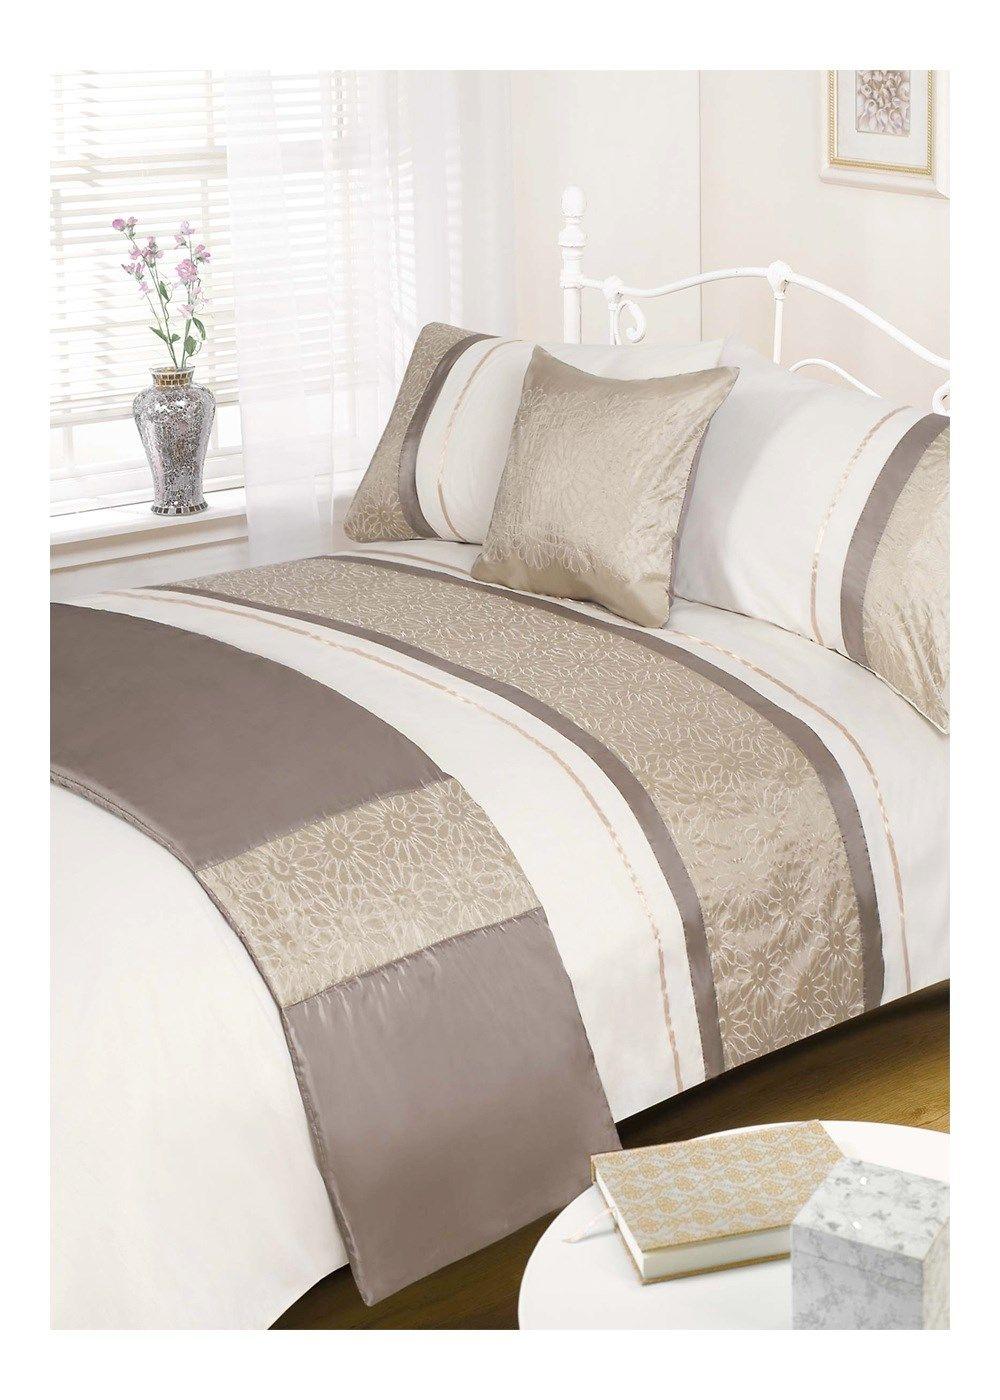 Angelina Embroidered Bed In A Bag Set Matalan Master Bedroom - Matalan bedroom furniture